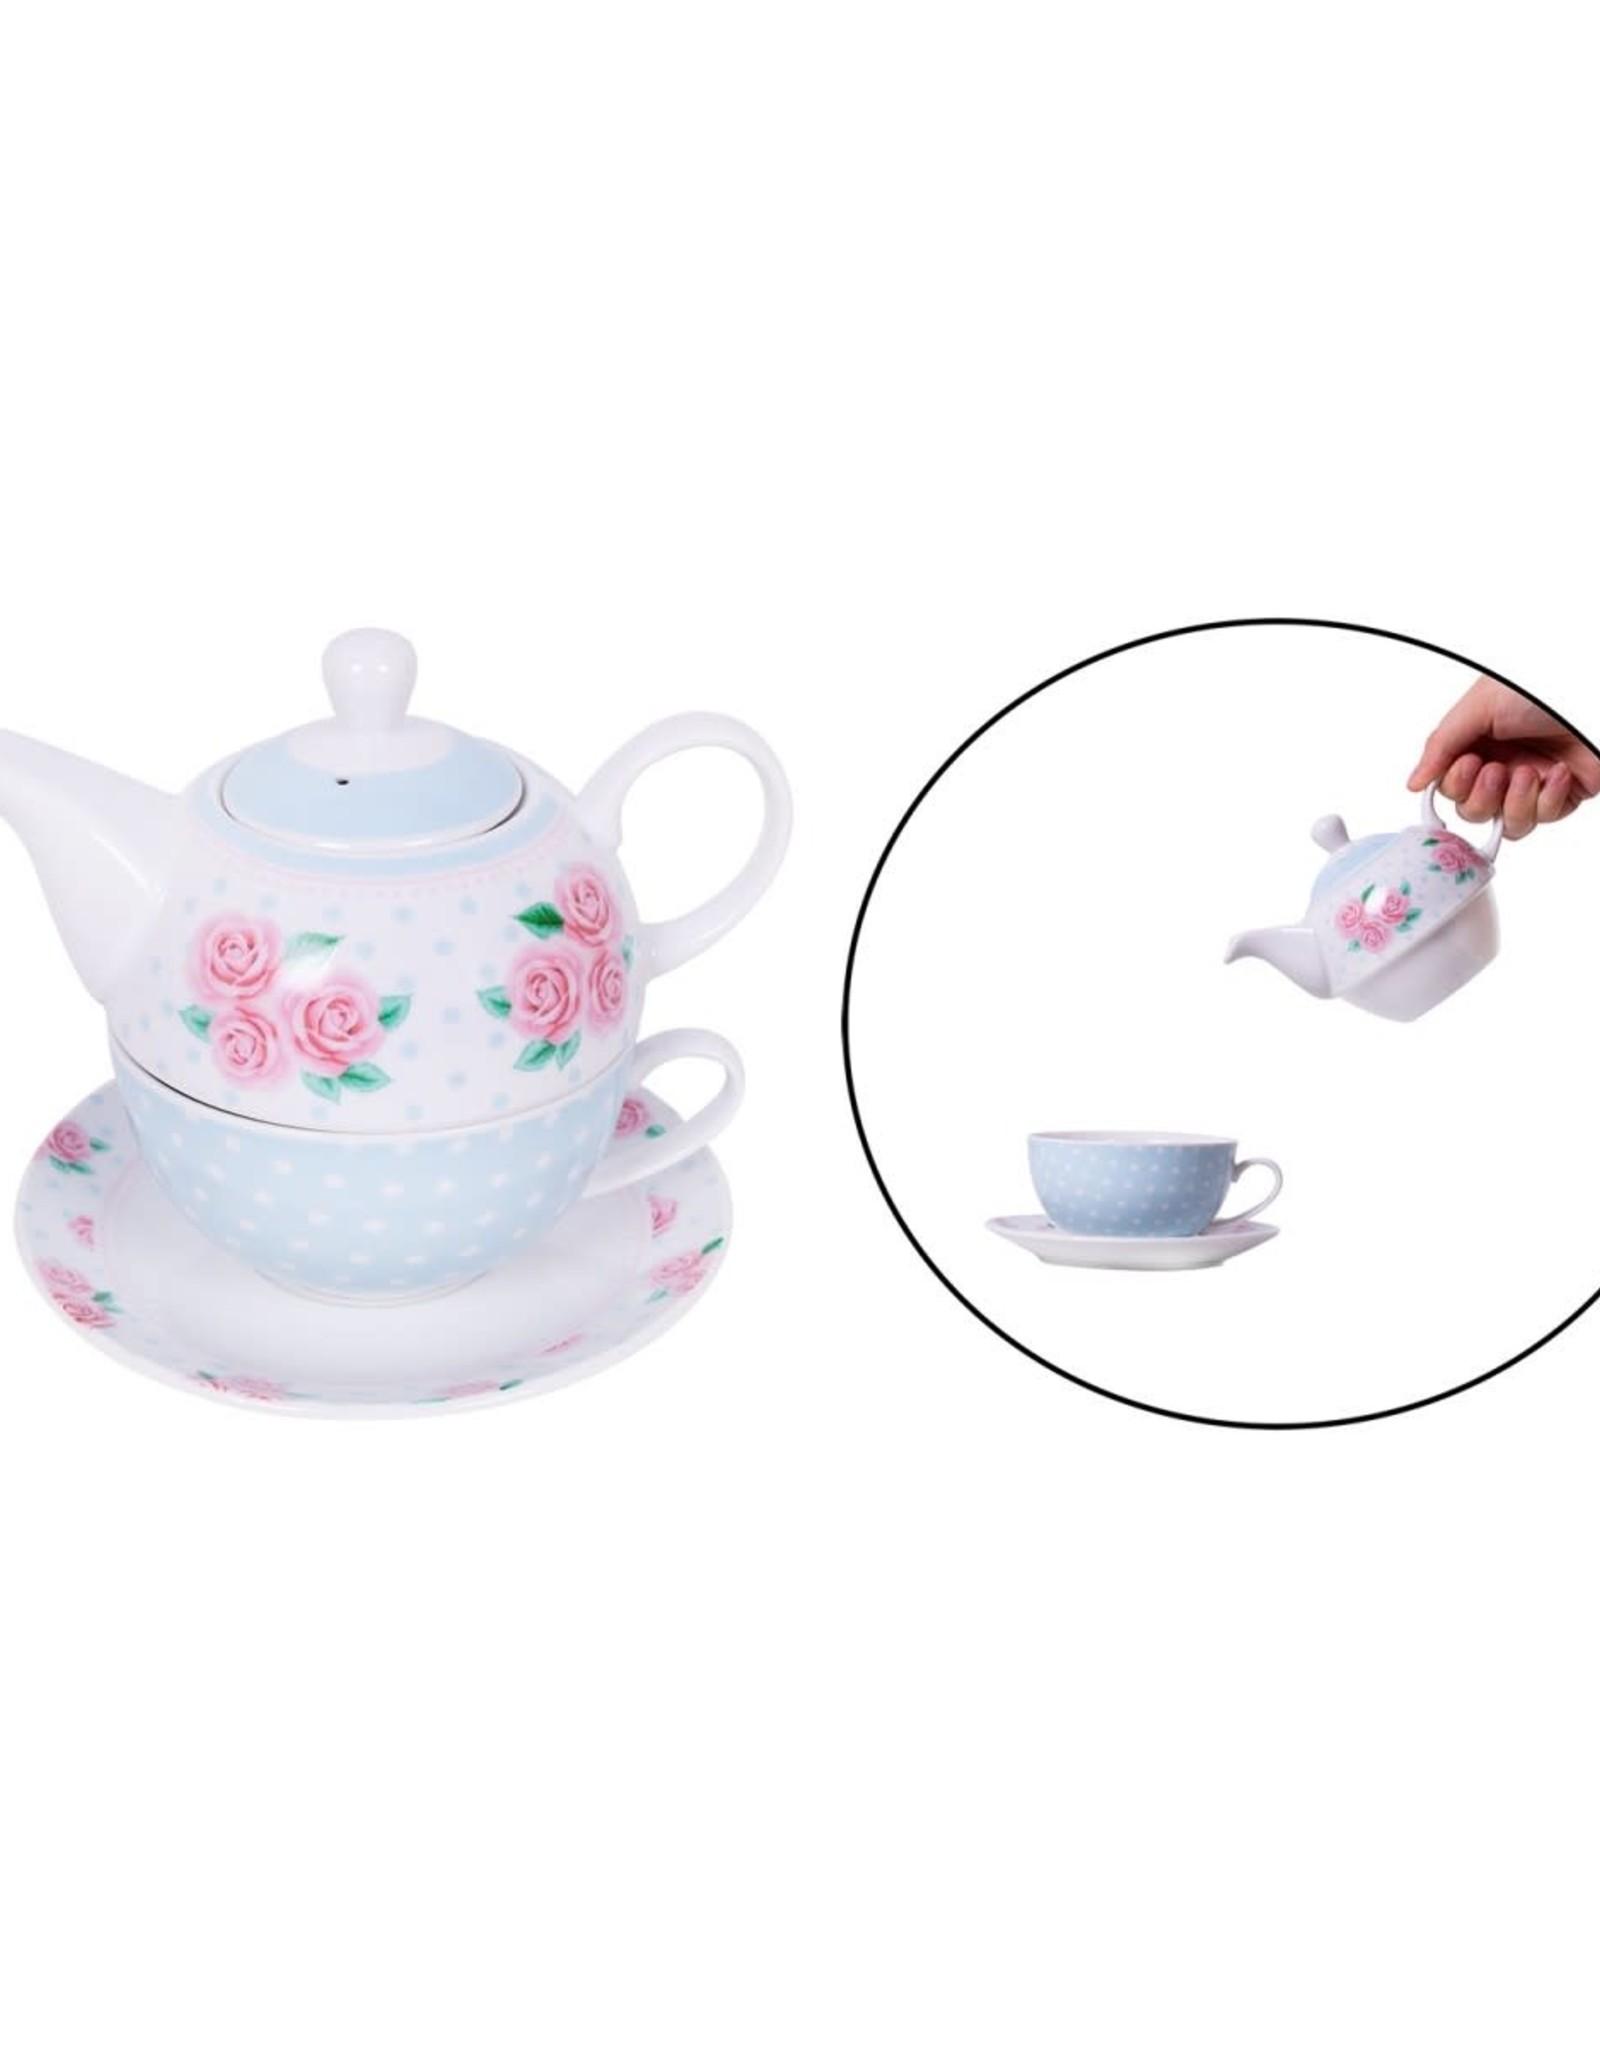 RSW Tea For One Set